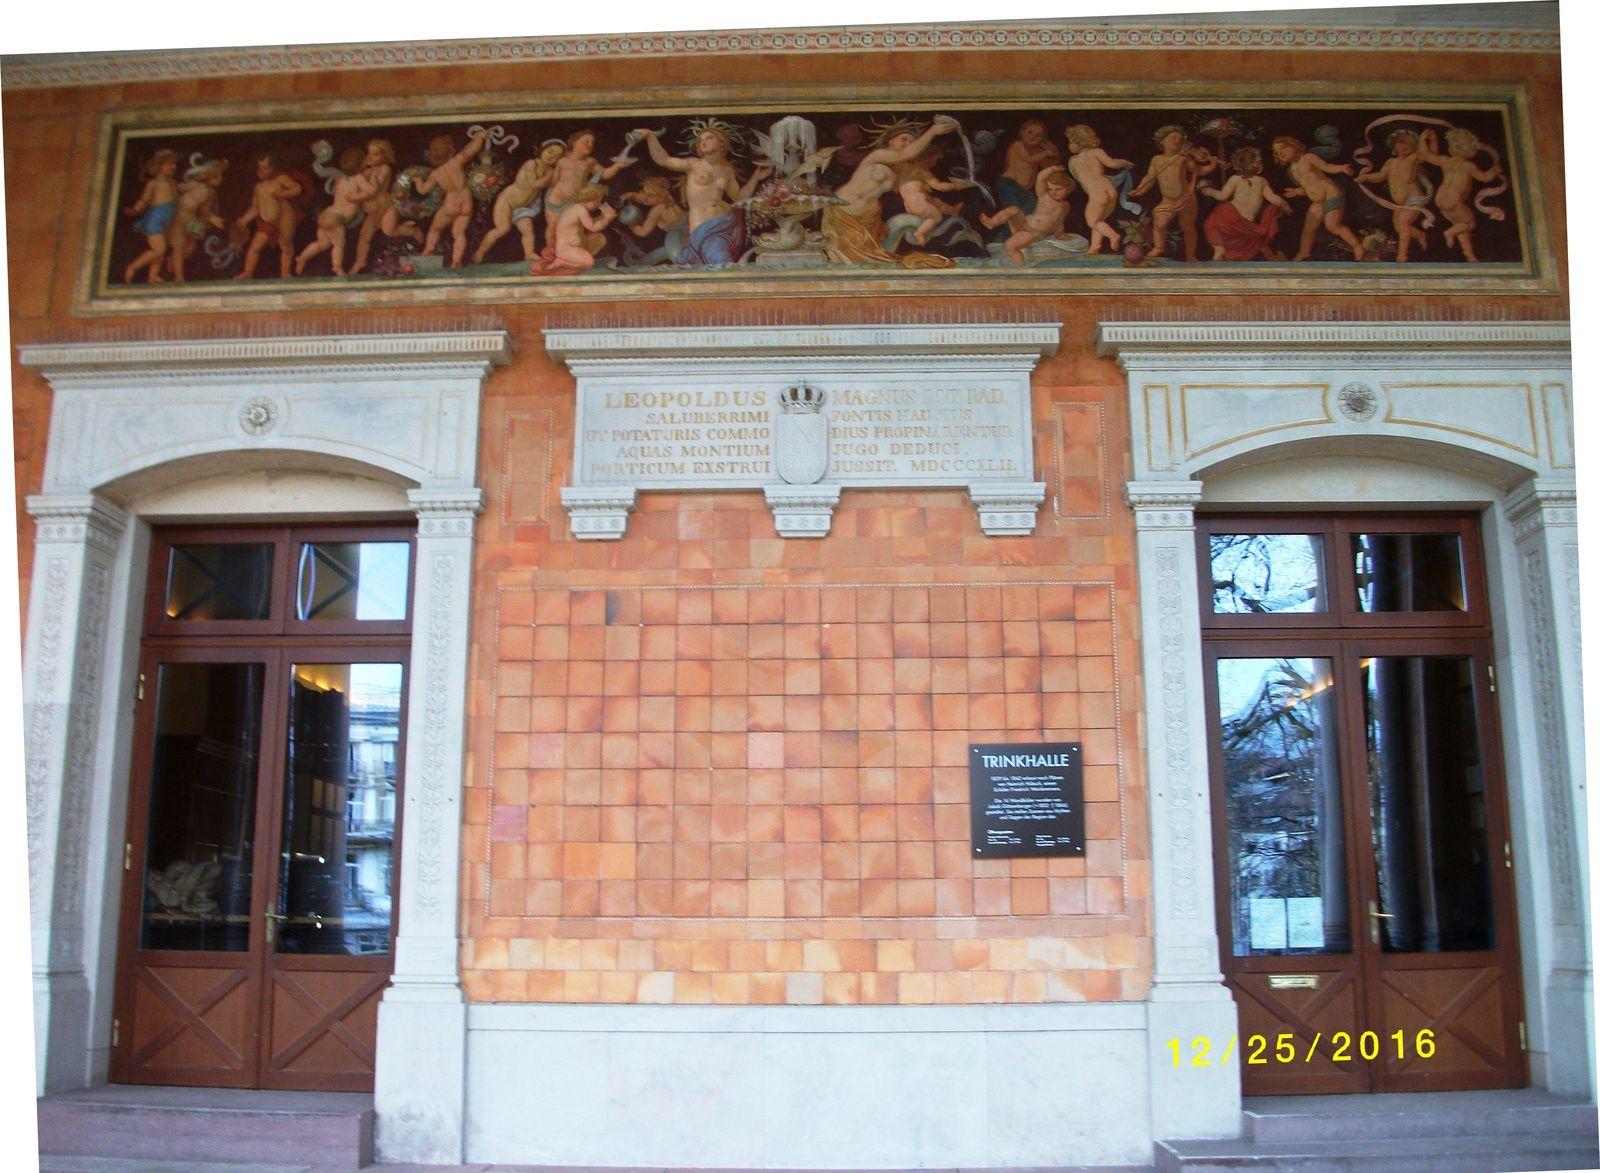 """Leopoldus Trinkhalle, In&Out - Baden-Baden, décembre 2016"